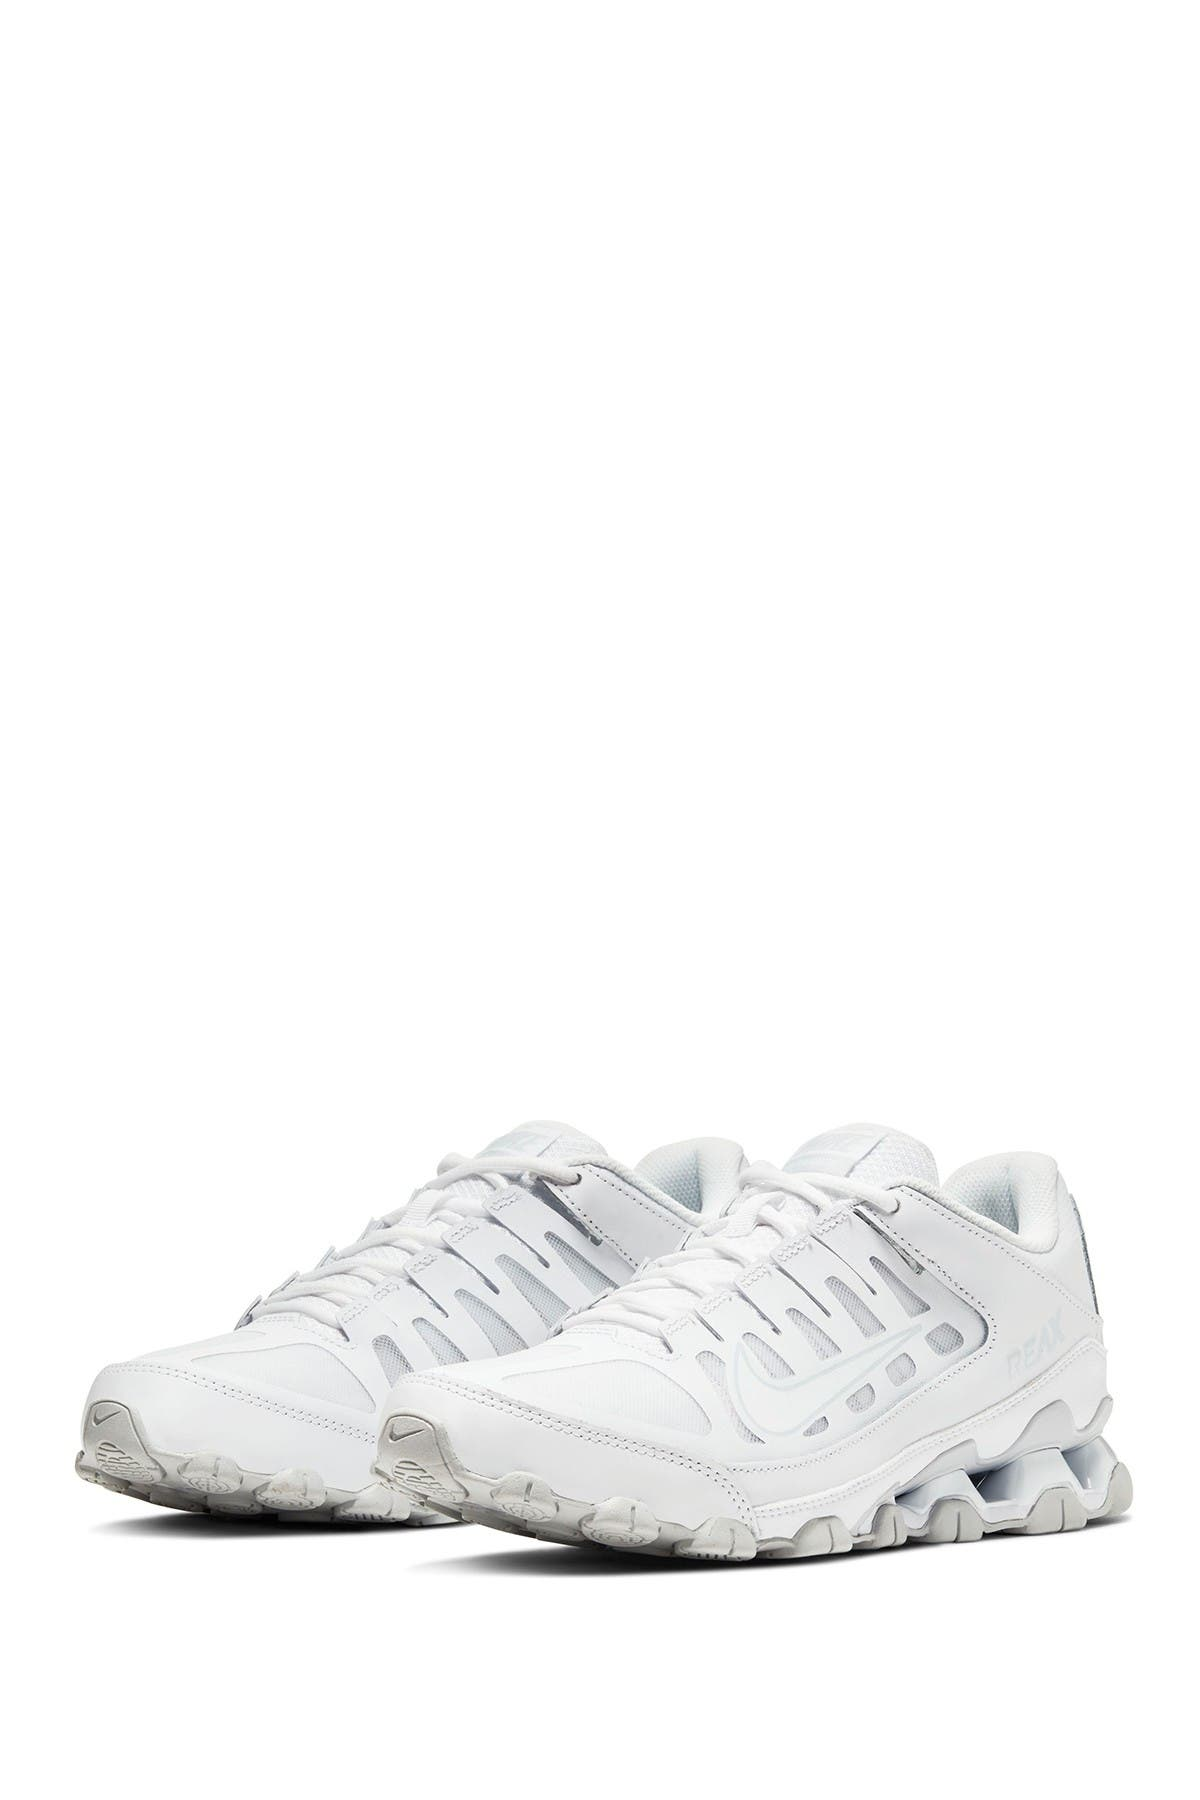 Image of Nike Reax 8 Training Mesh Sneaker